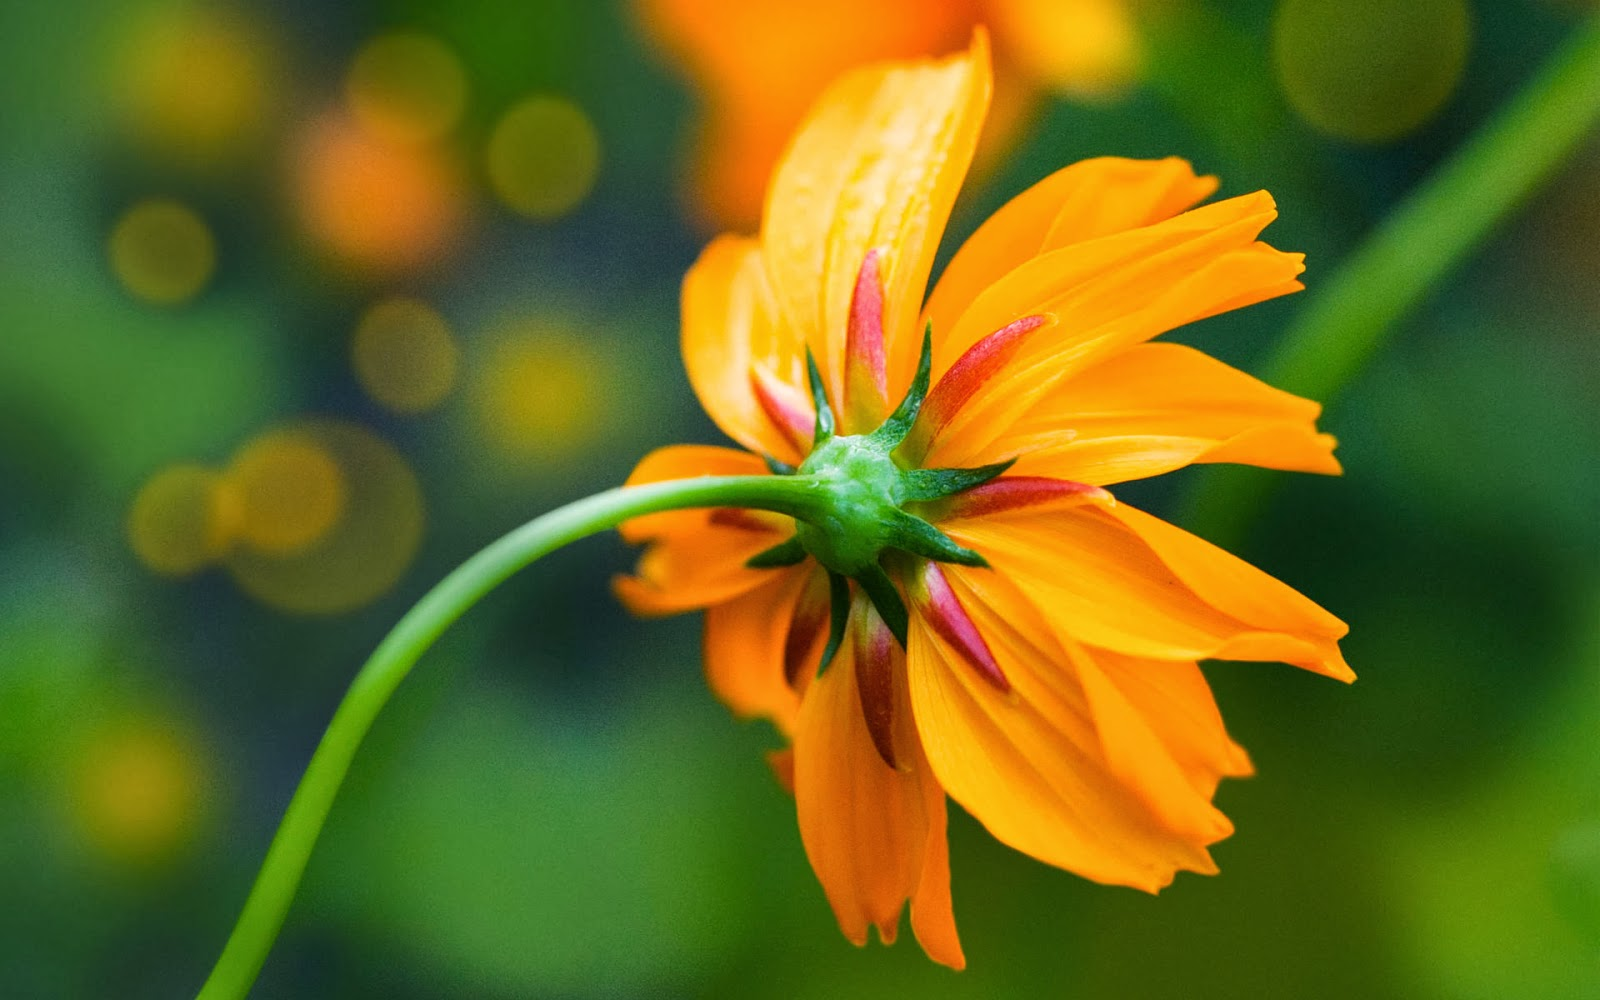 "<img src=""http://1.bp.blogspot.com/-BzezLUBi7Lc/UulZW6begMI/AAAAAAAAKpg/kqlJknNucvE/s1600/orange-daisy-wallpaper.jpg"" alt=""orange daisy wallpaper"" />"